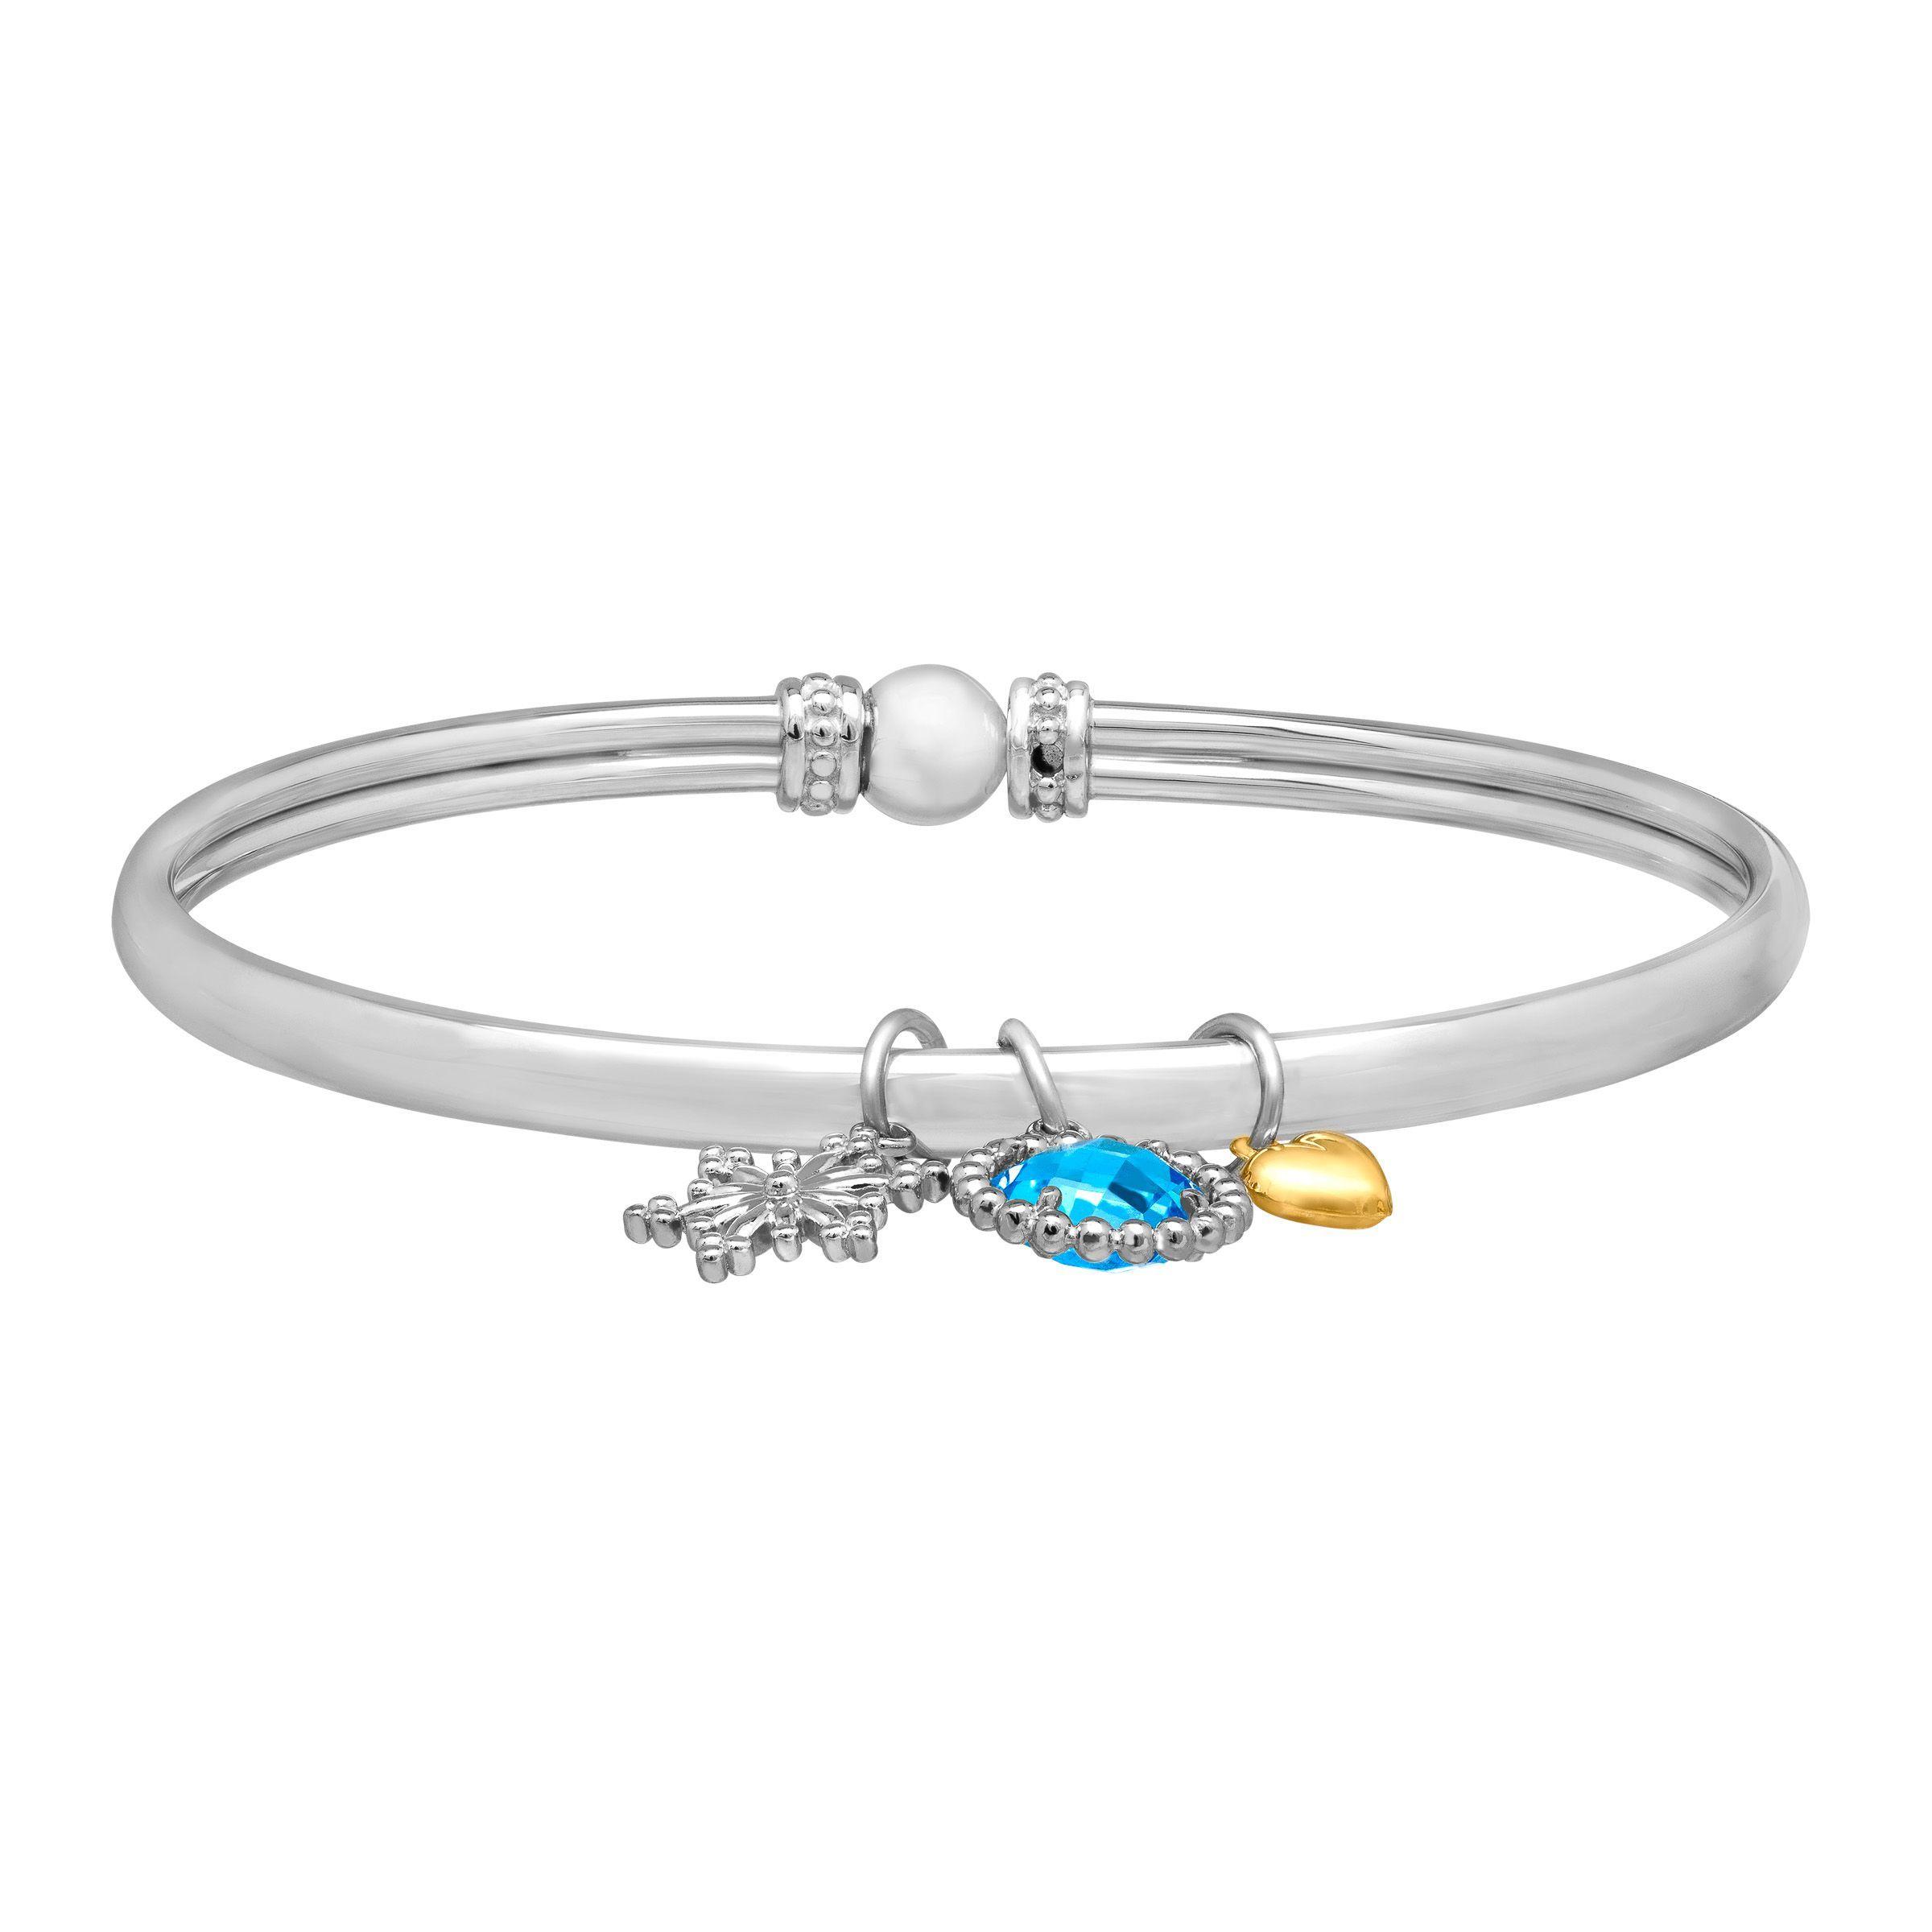 Blue Charm Bracelet: 2 1/4 Ct Swiss Blue Topaz Snowflake Charm Bangle Bracelet